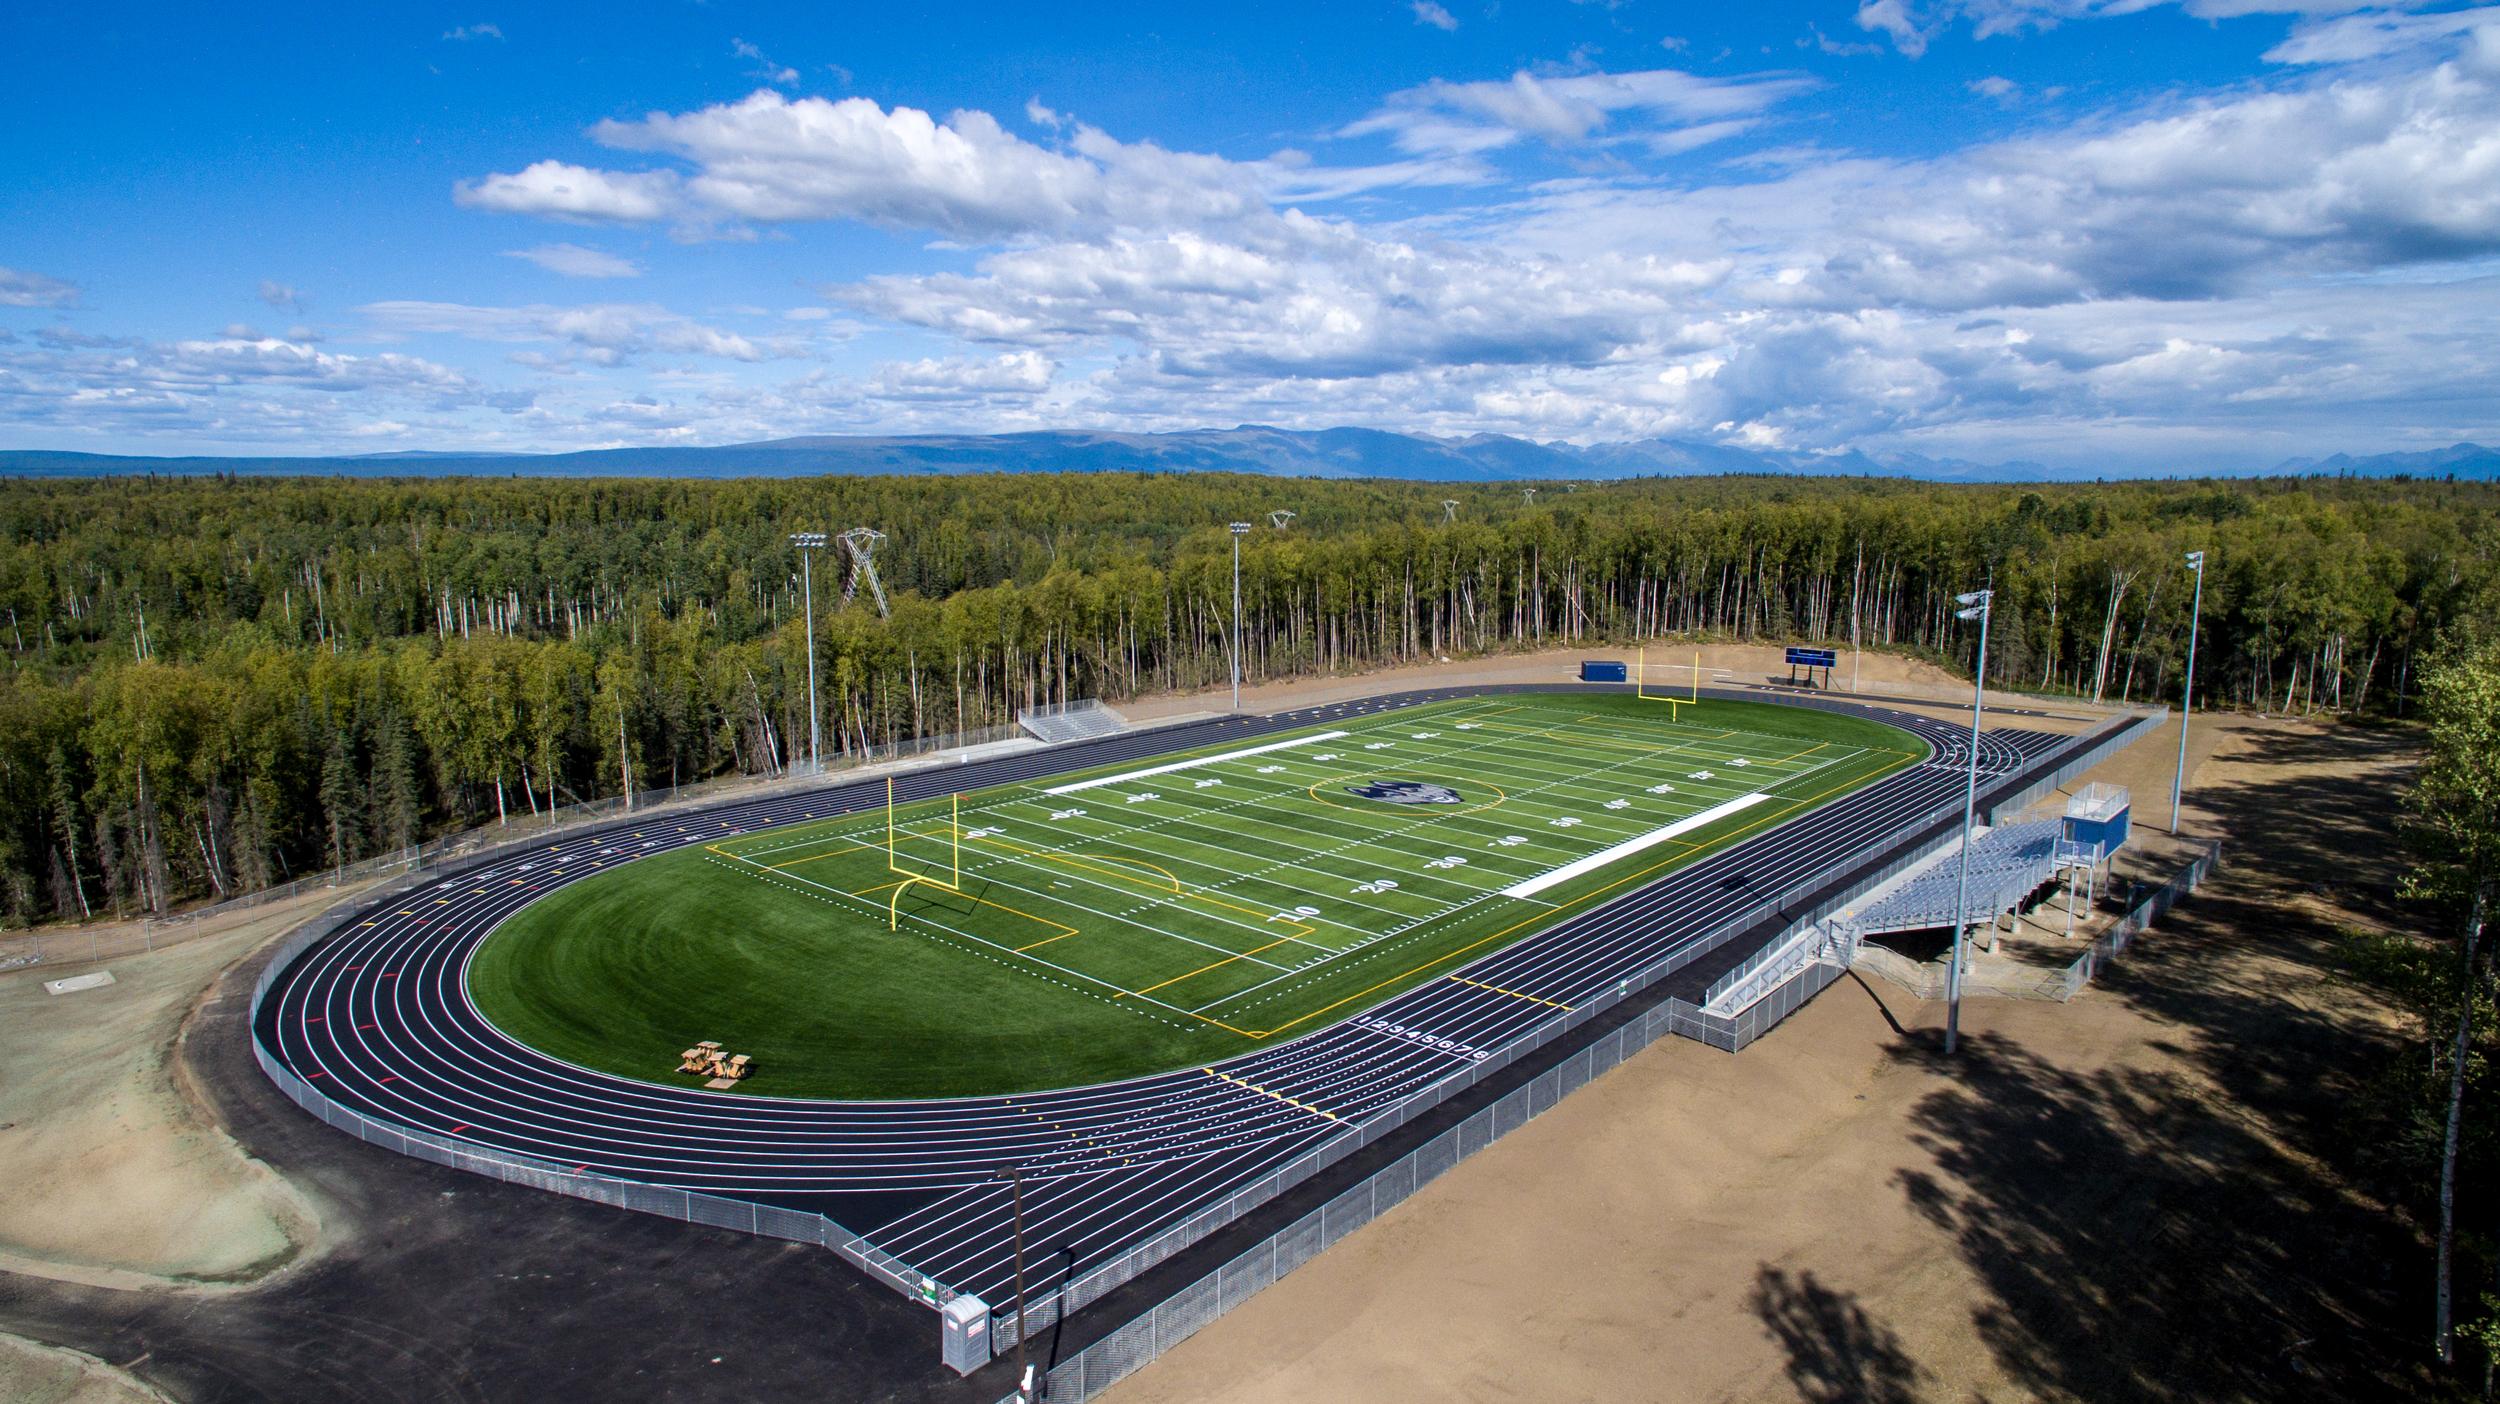 131023 - Redington SR JR-SR High School - aerial-4.jpg